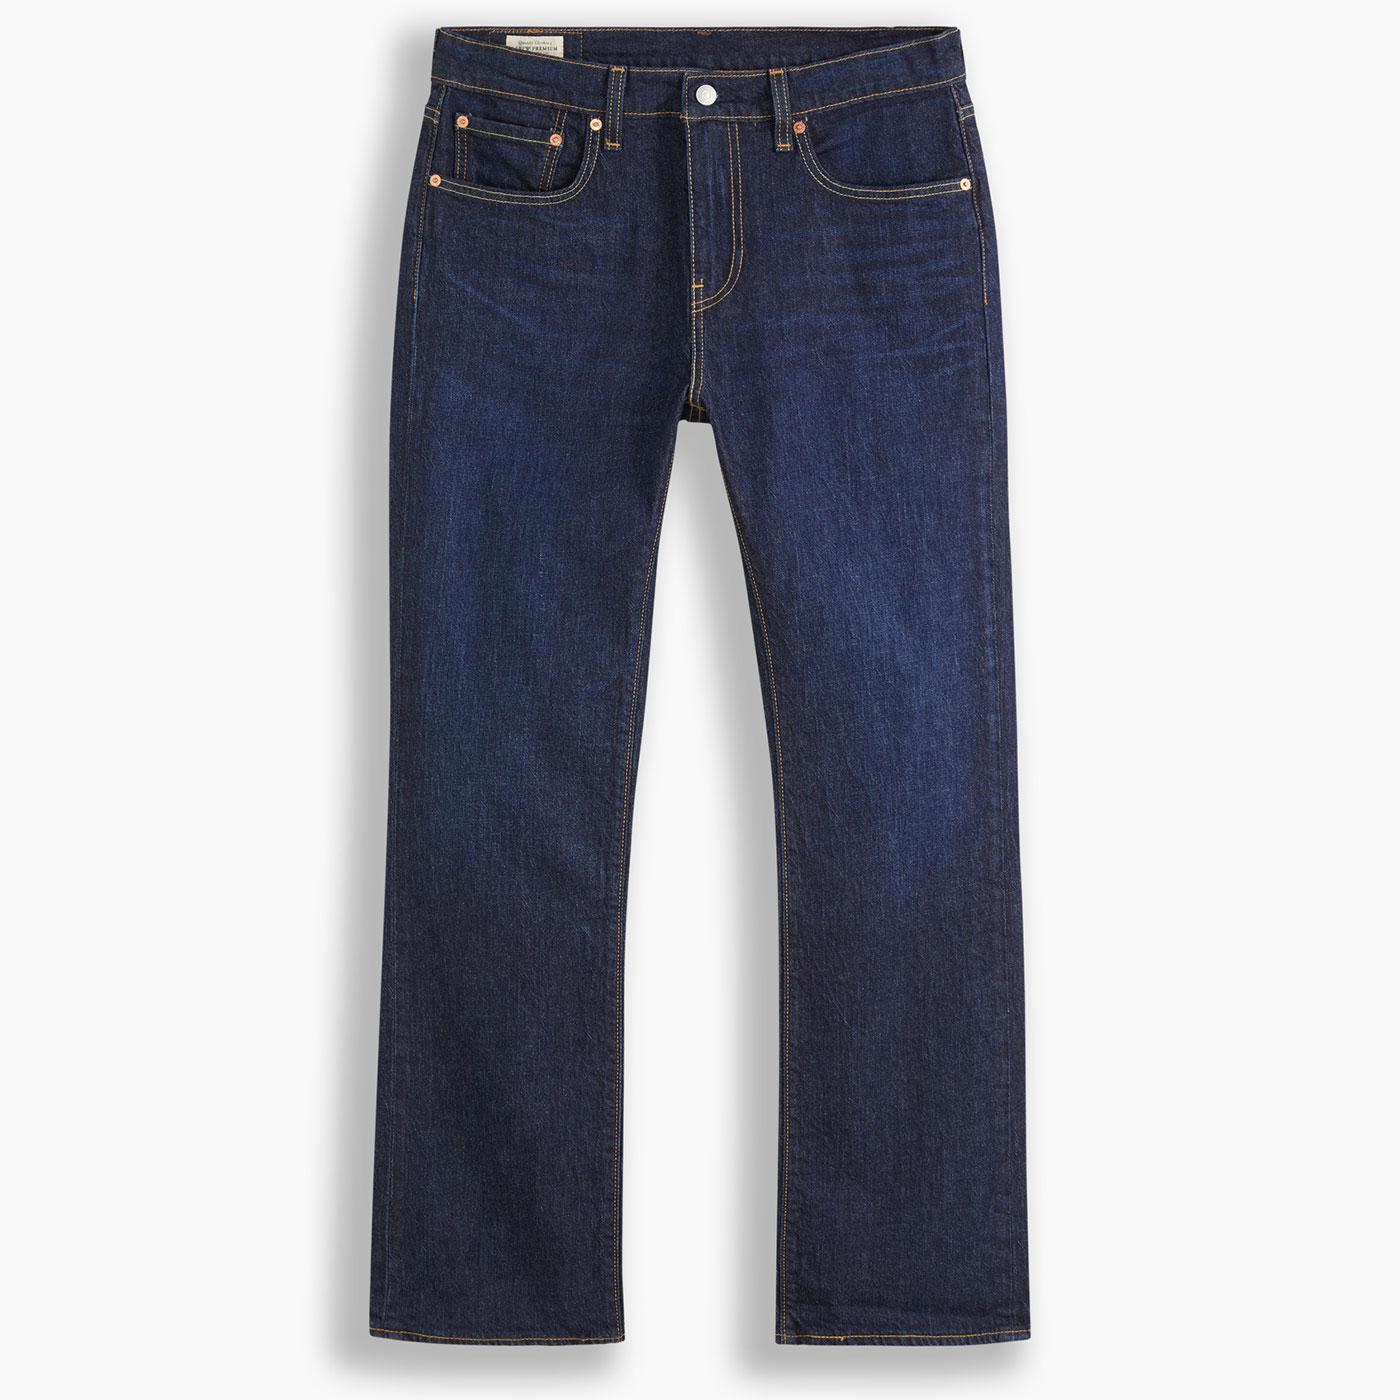 LEVI'S 527 Retro Slim Bootcut Jeans (Feelin Right)